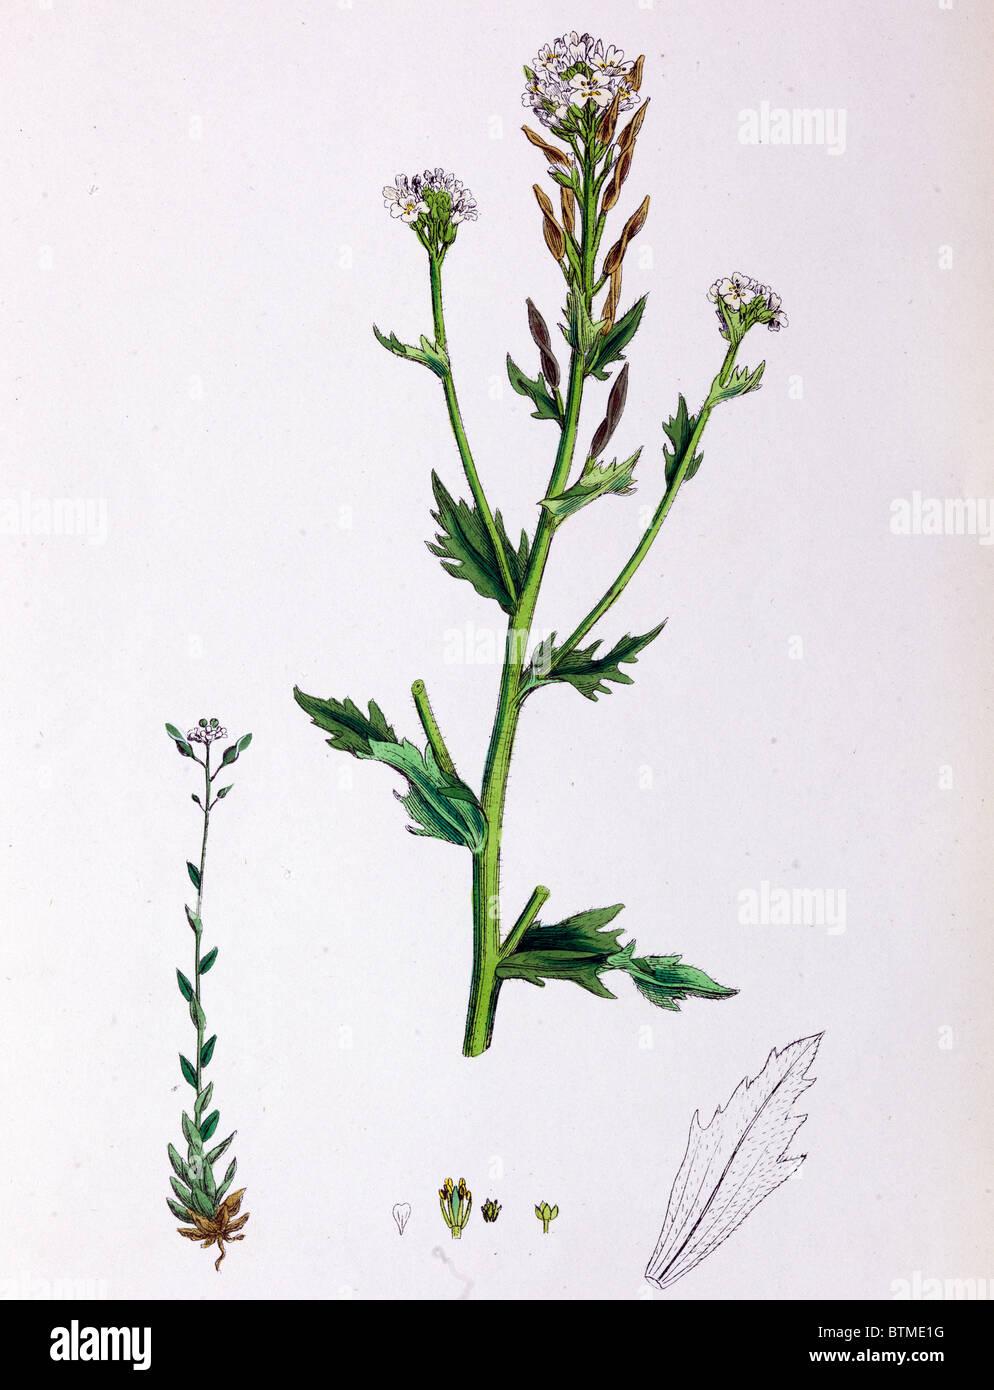 Stampa botanico,Twisted Podded Whitlow erba, XIX secolo Immagini Stock